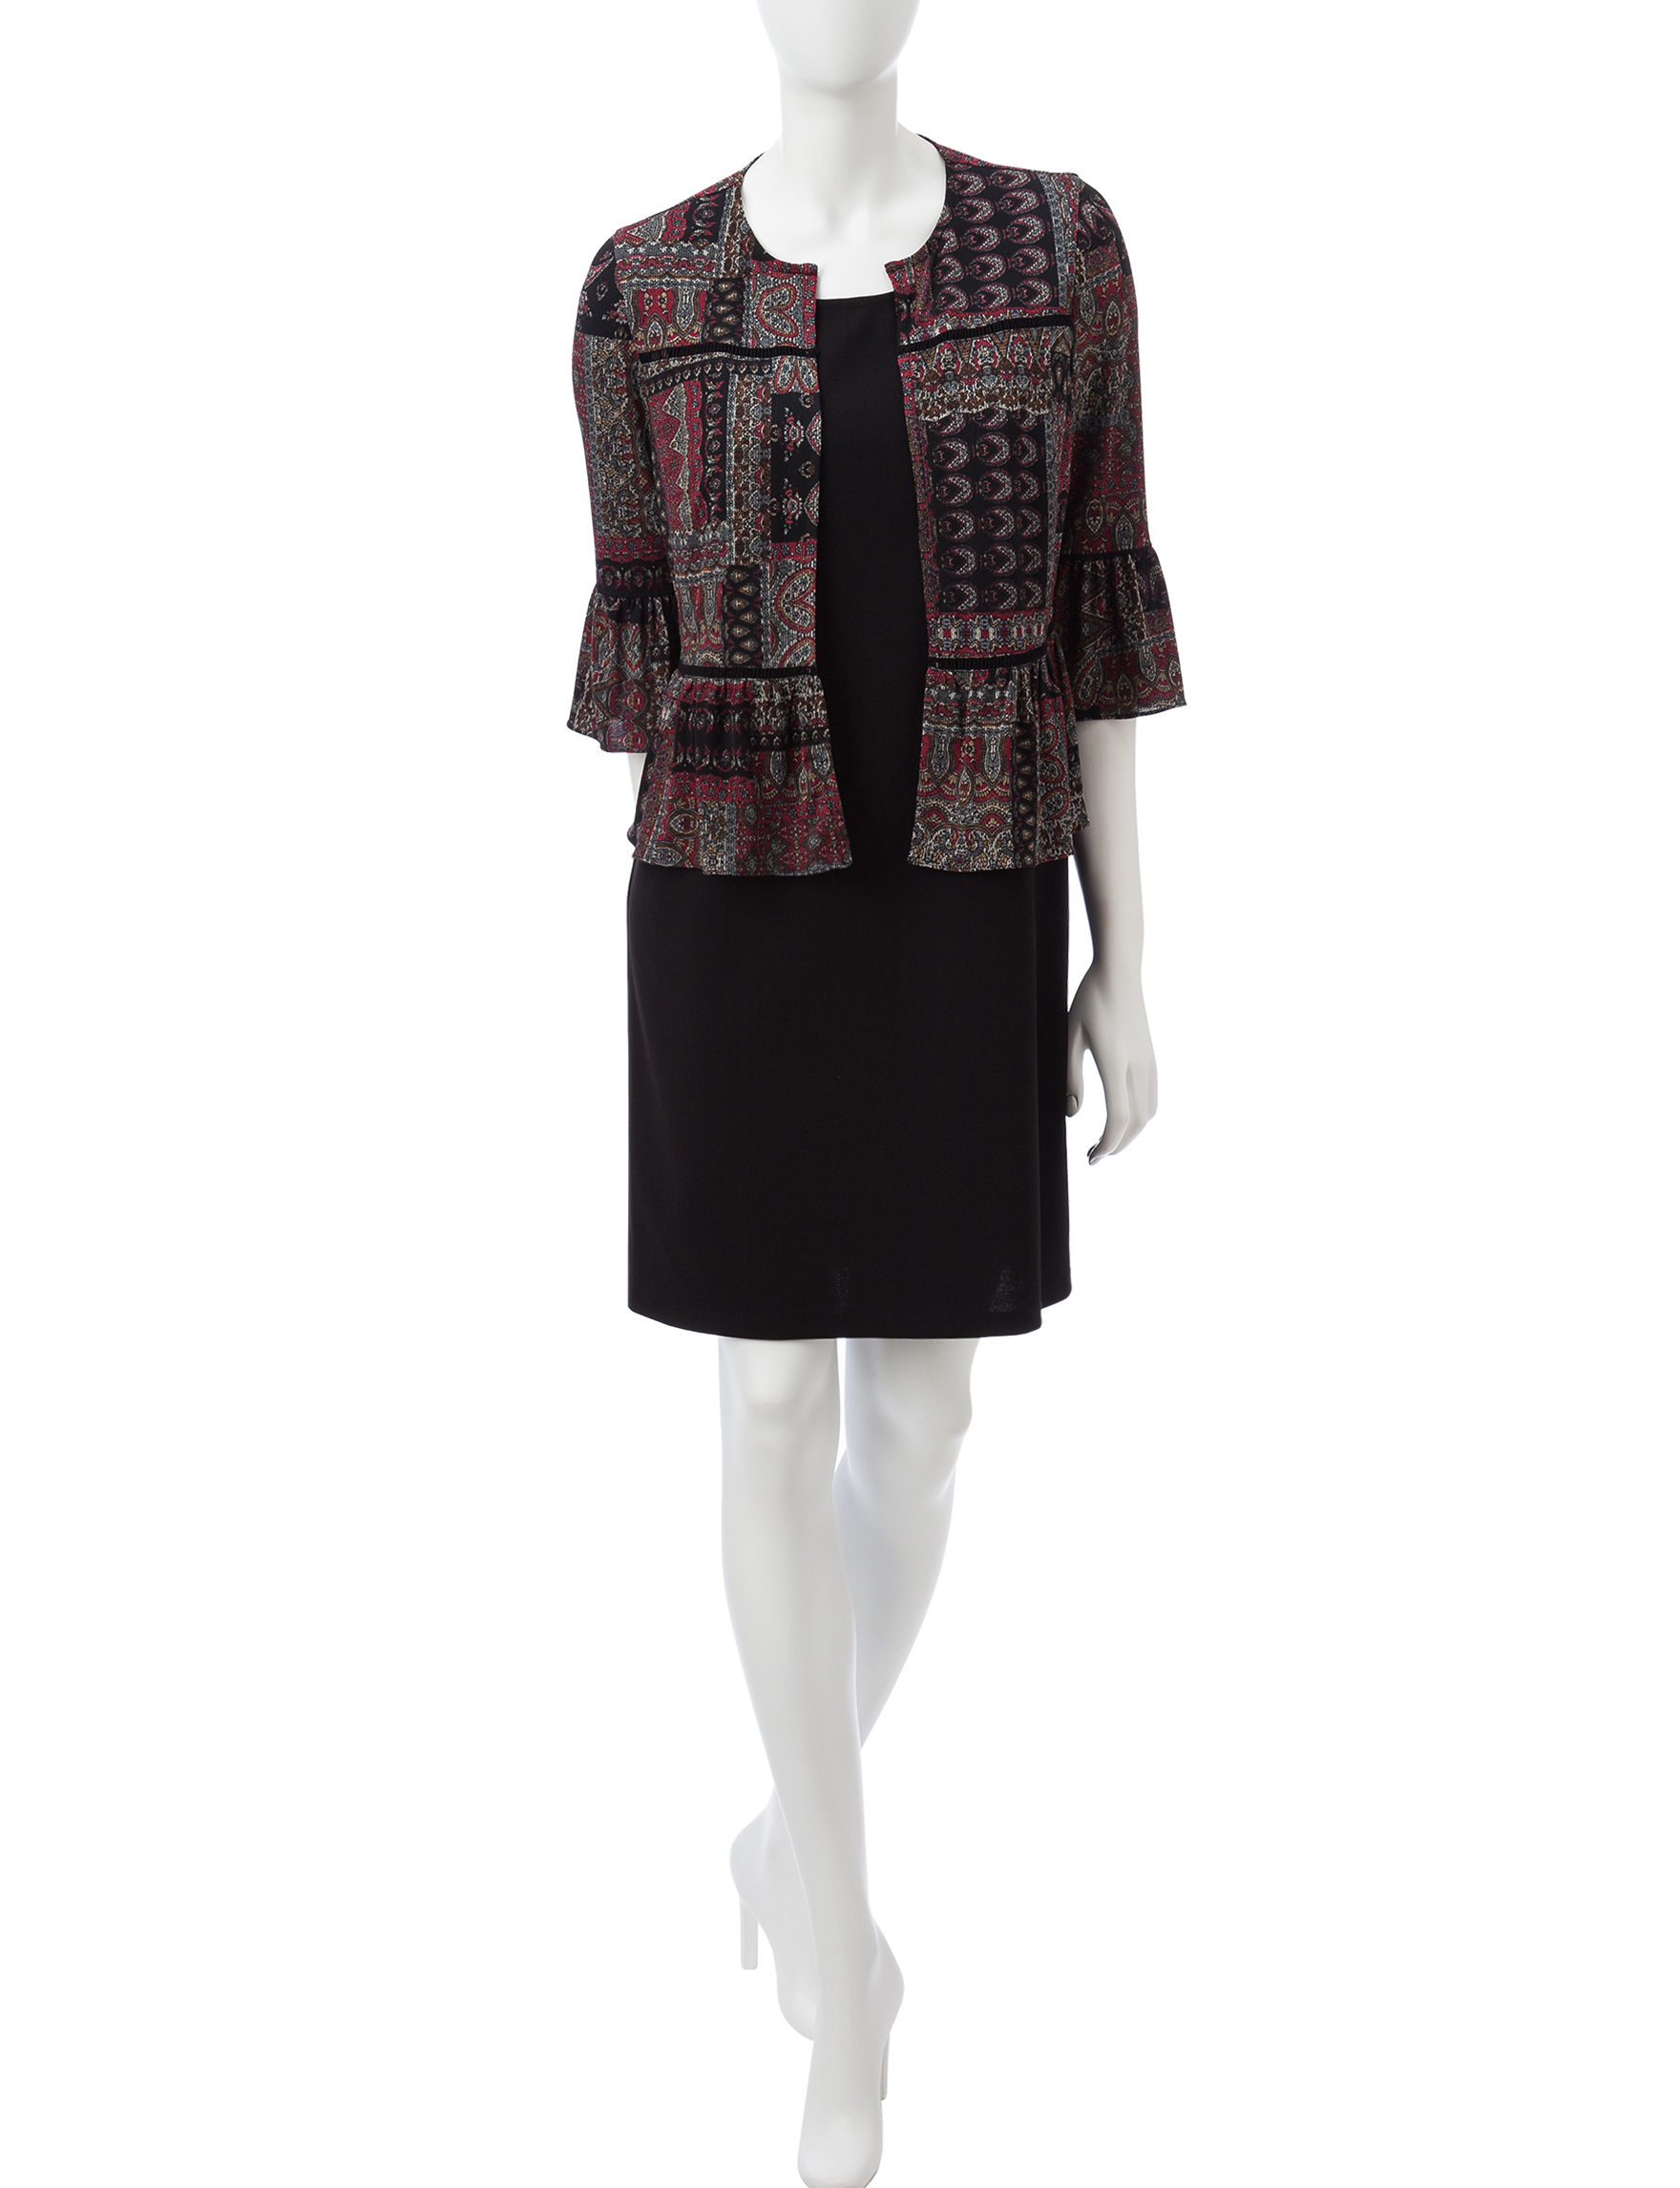 Perceptions Black Everyday & Casual Jacket Dresses